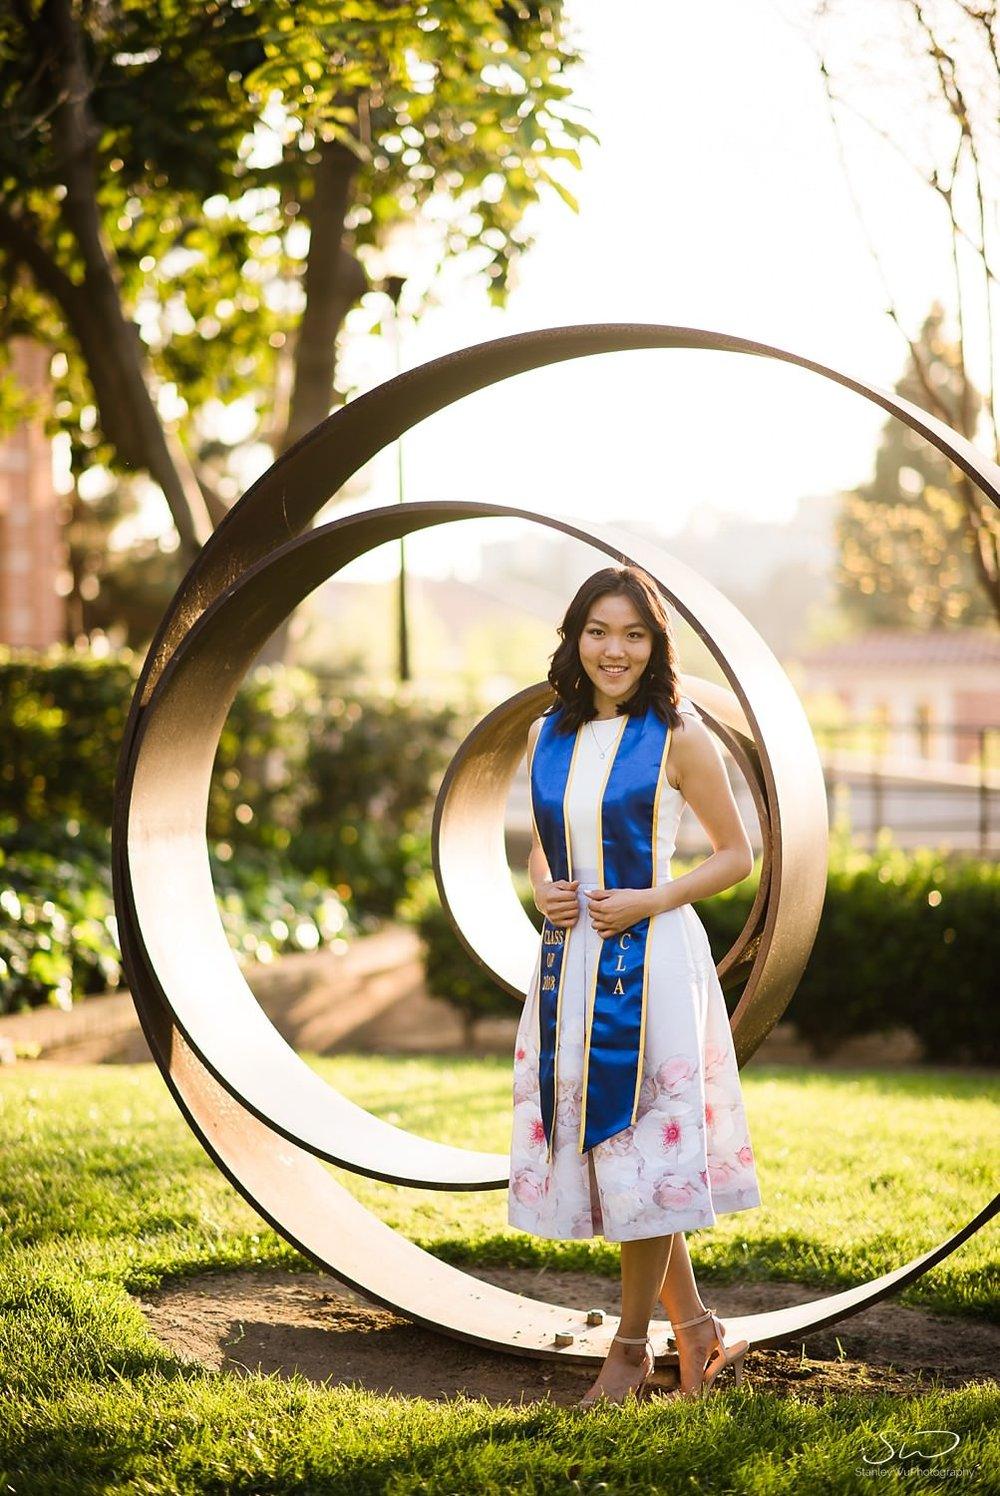 ucla-fashion-graduation-portrait-senior-session_0080.jpg